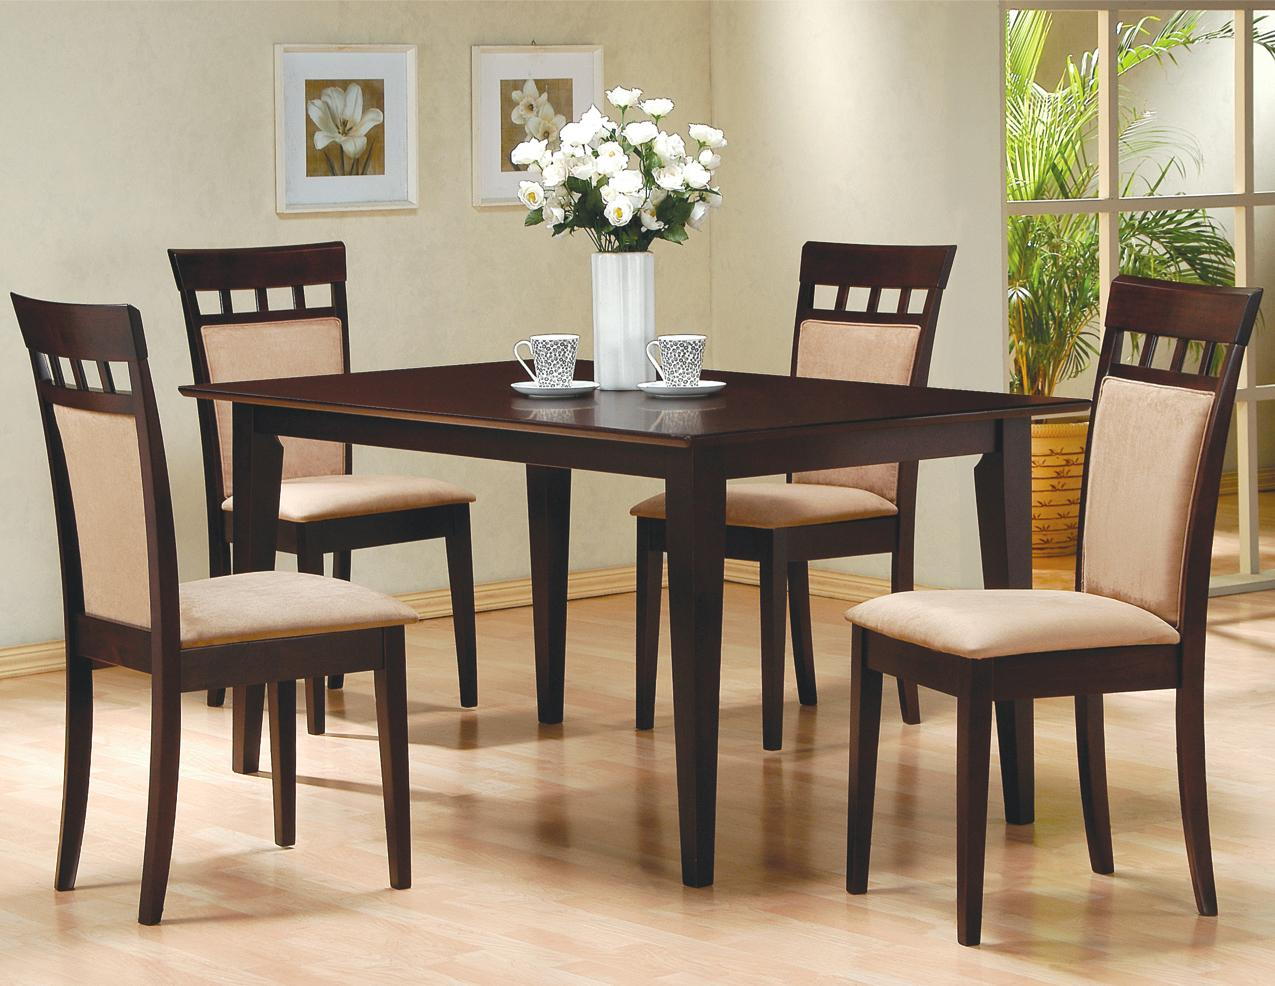 cae9d8e924d1f5 Coaster Mix & Match 5 Piece Dining Set | Dunk & Bright Furniture ...